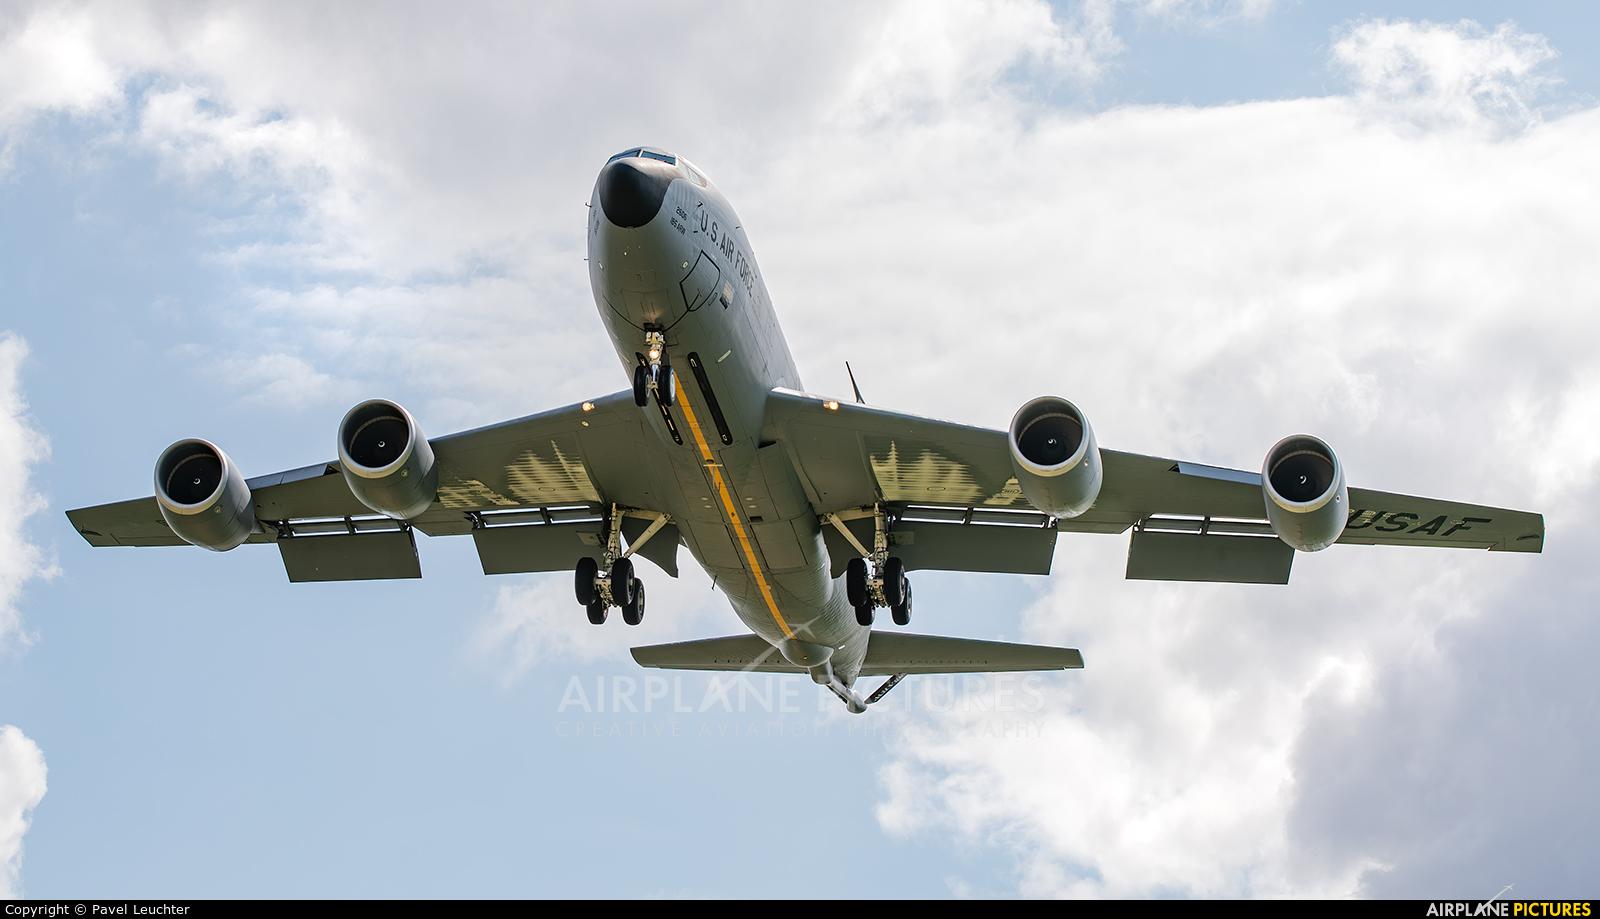 USA - Air Force 57-2606 aircraft at Pardubice